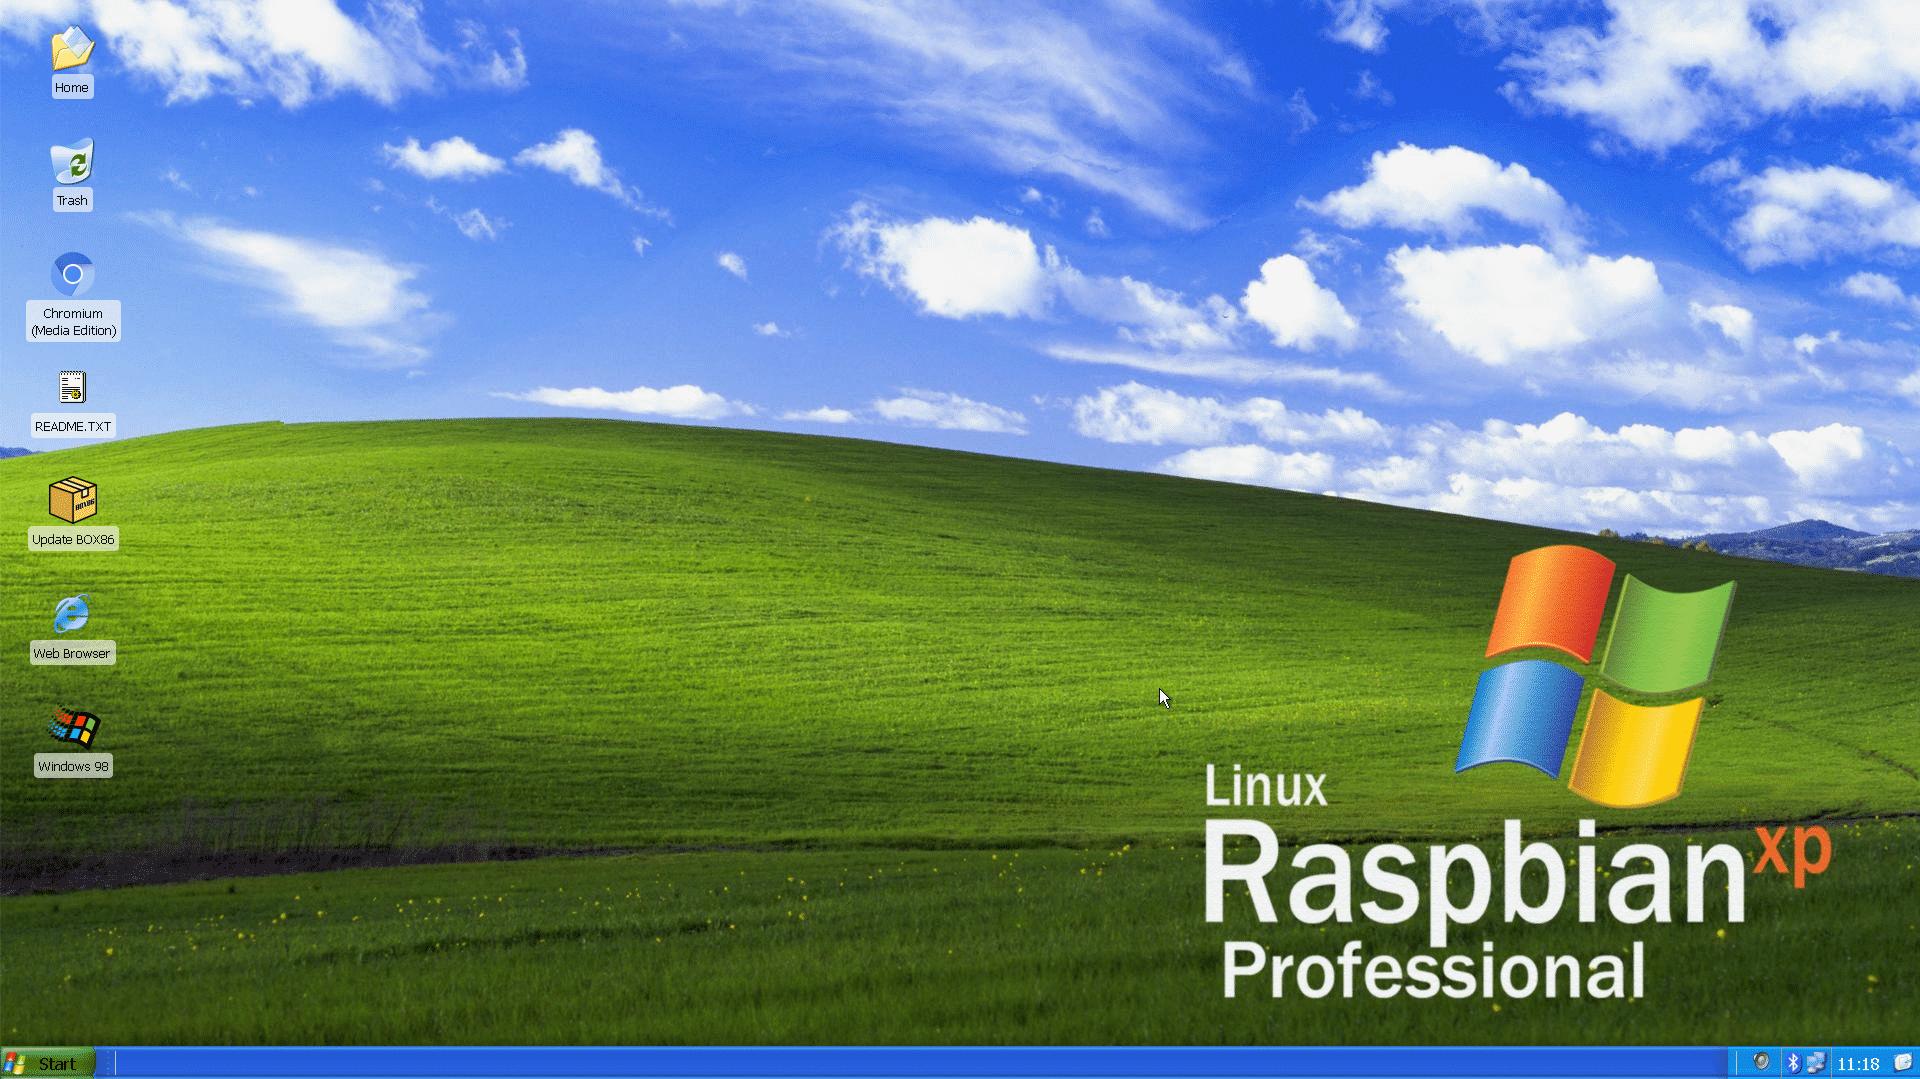 Raspi-Distribution im Windows-Look